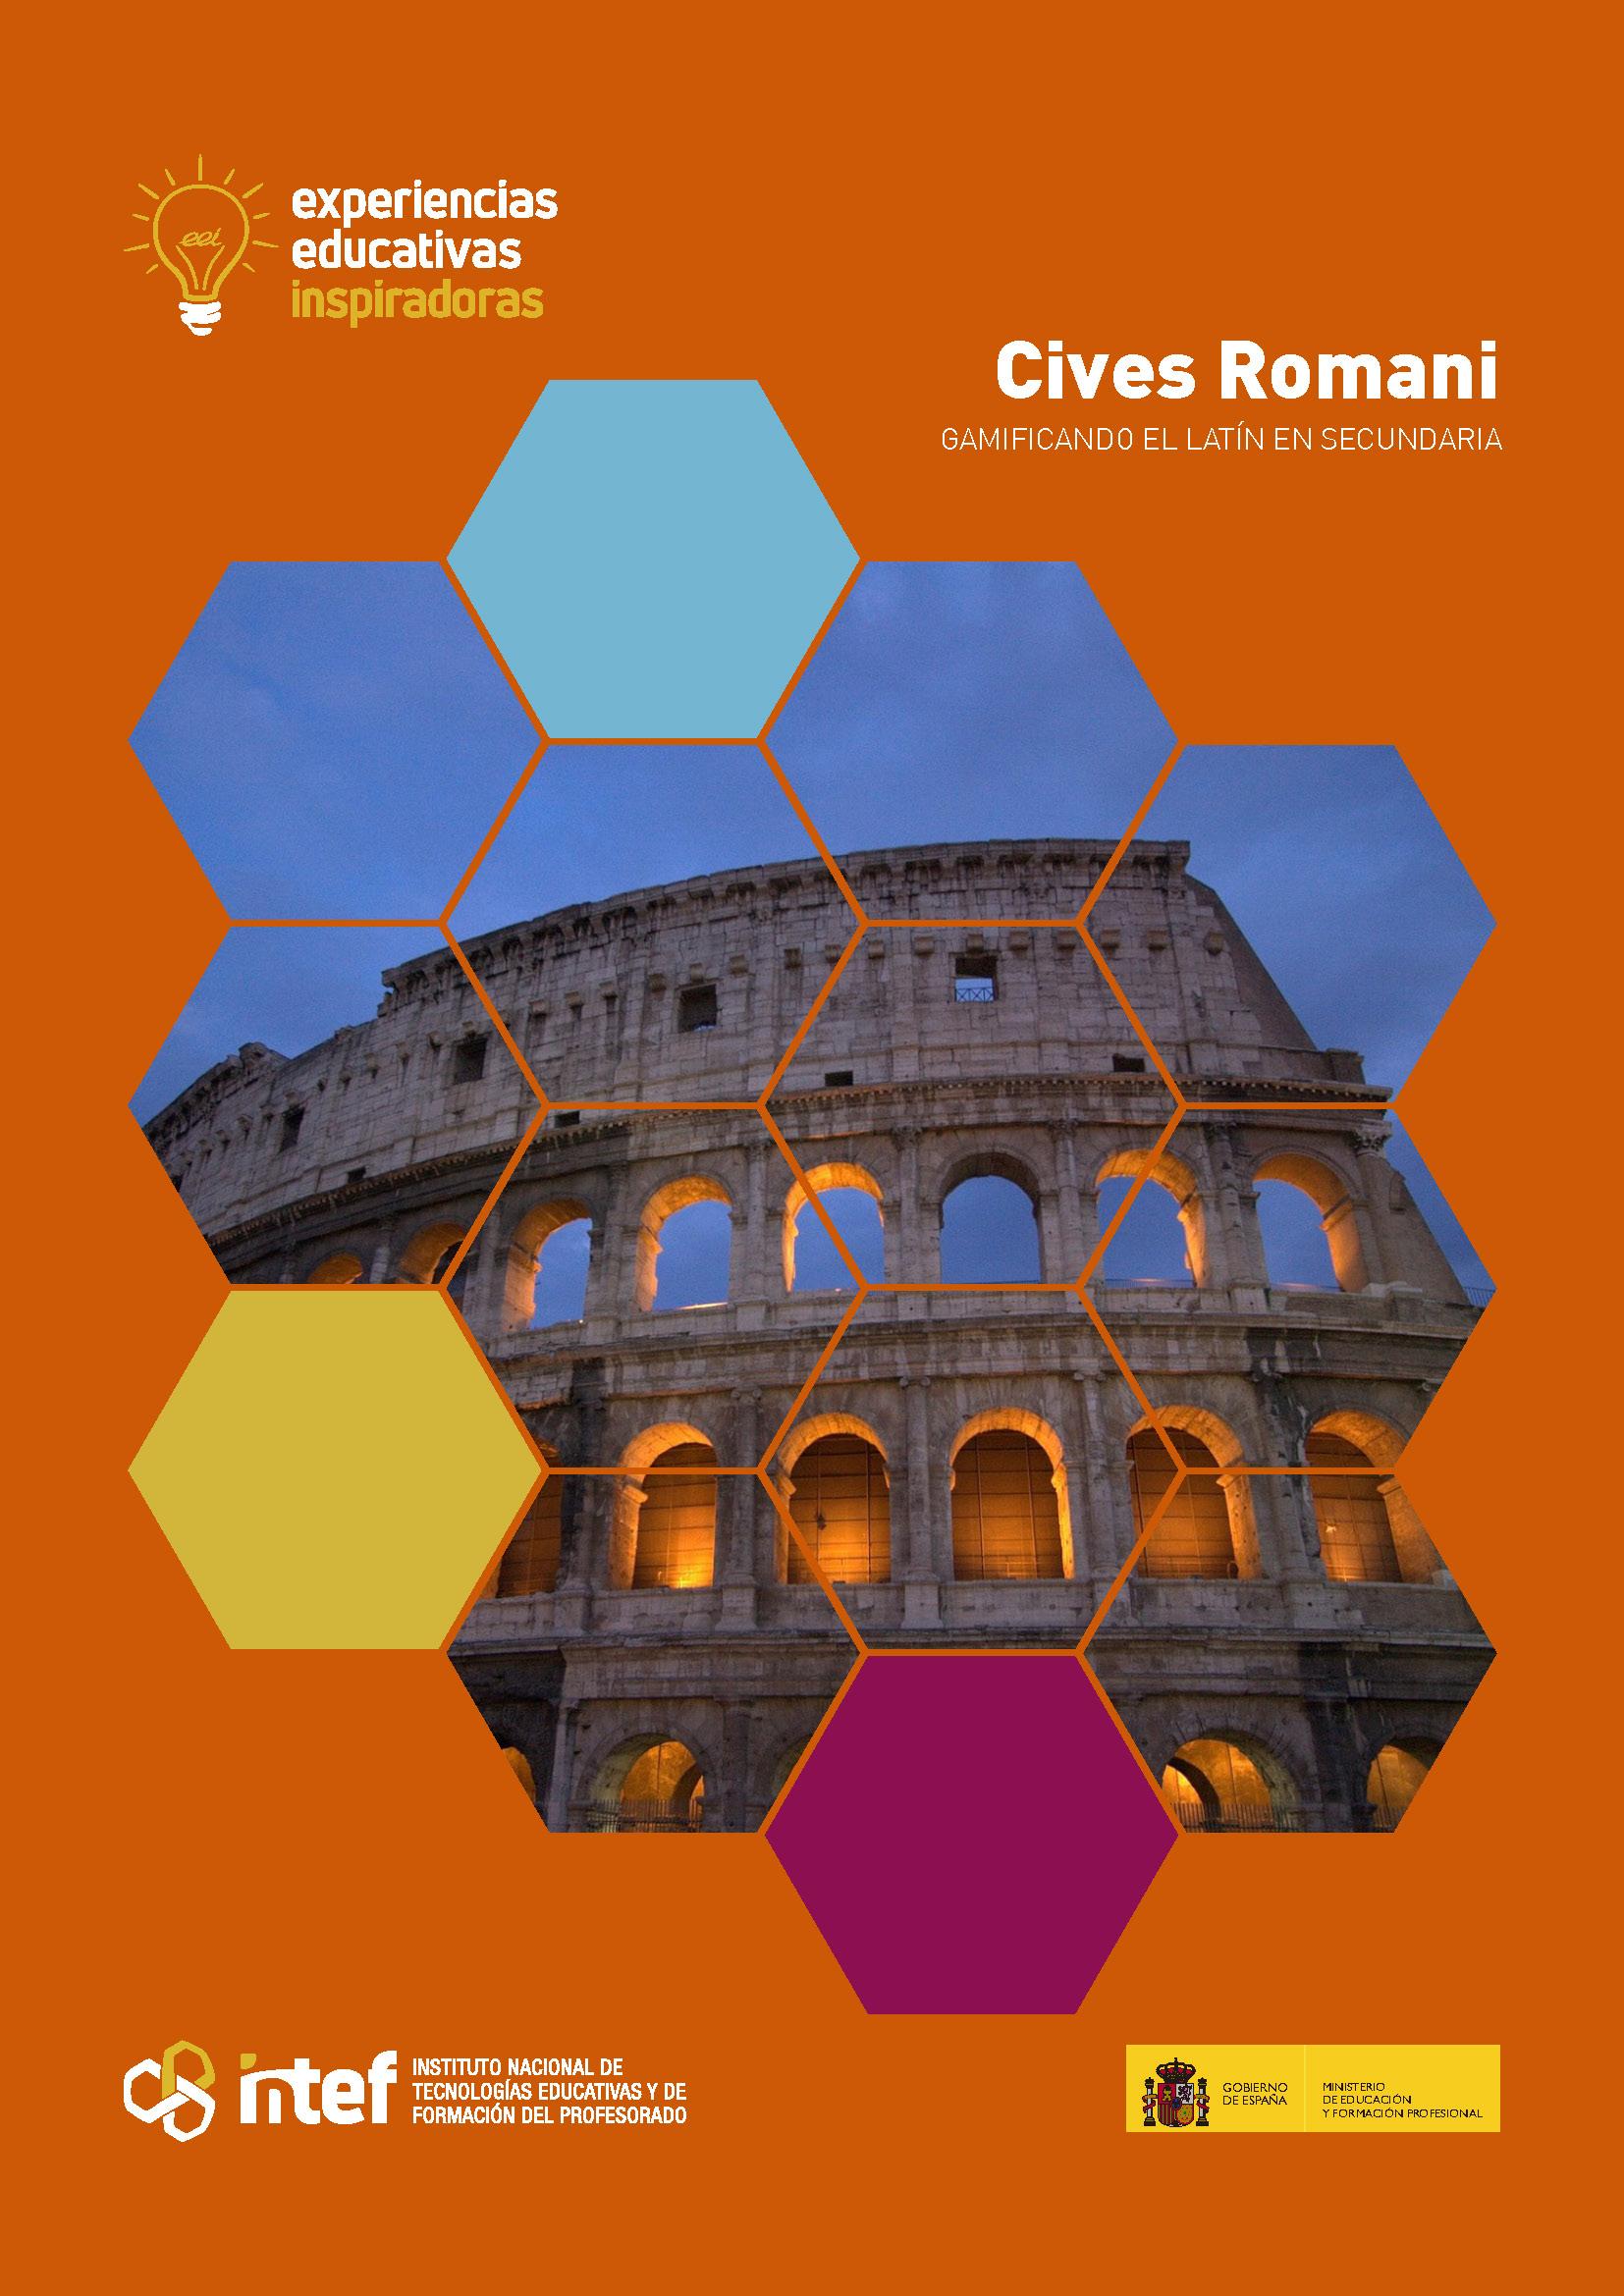 Portada de la Experiencia Cives Romani